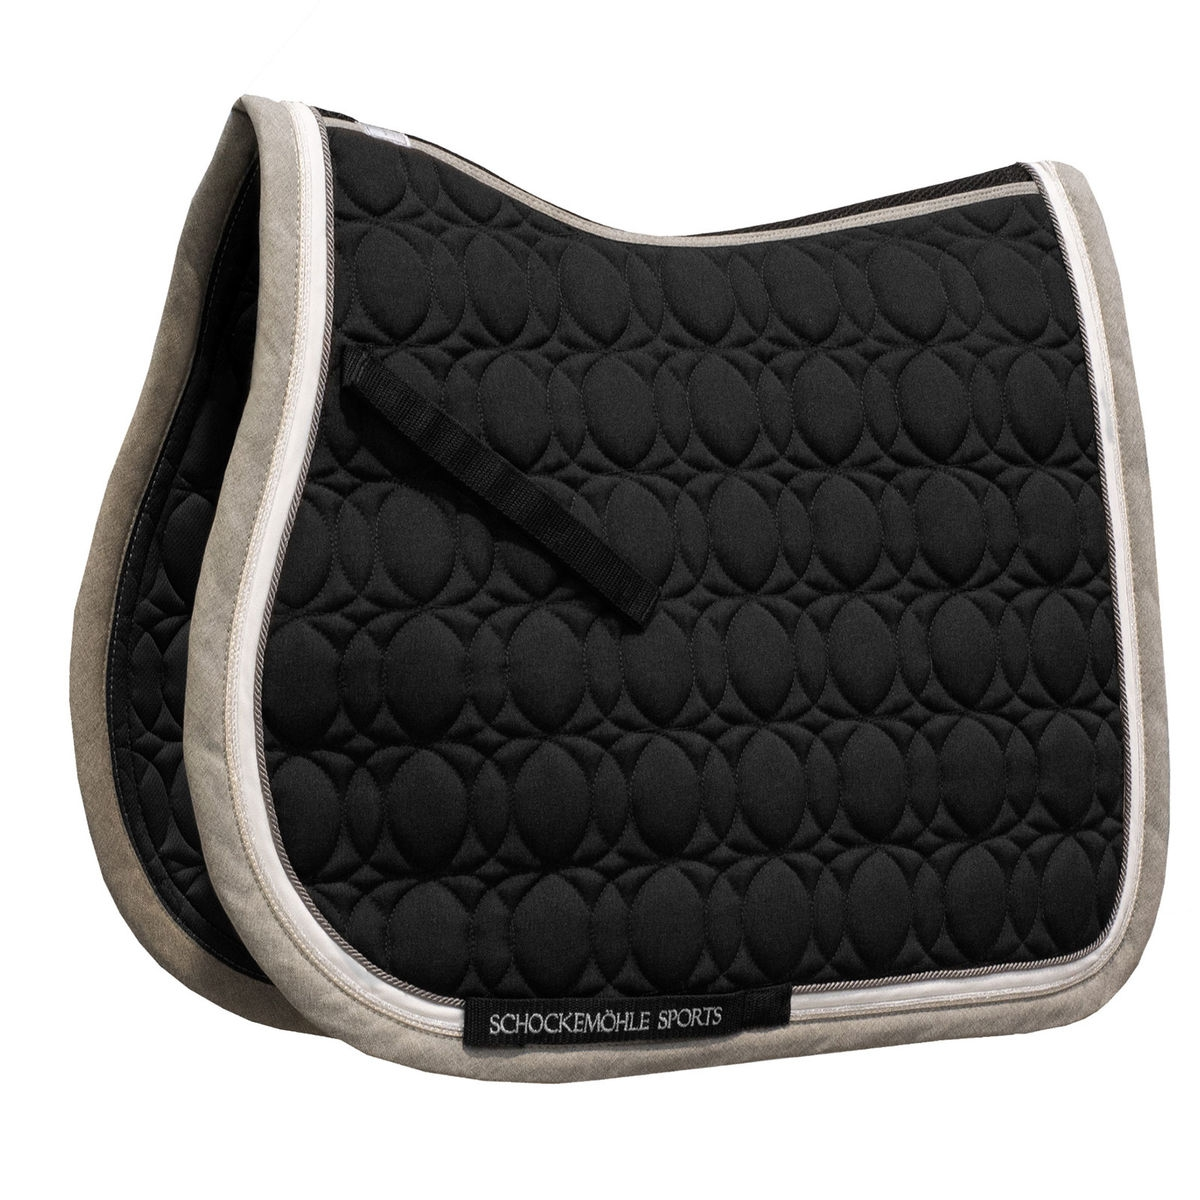 Potnik Air Cool Pad - SCHOCKEMOHLE